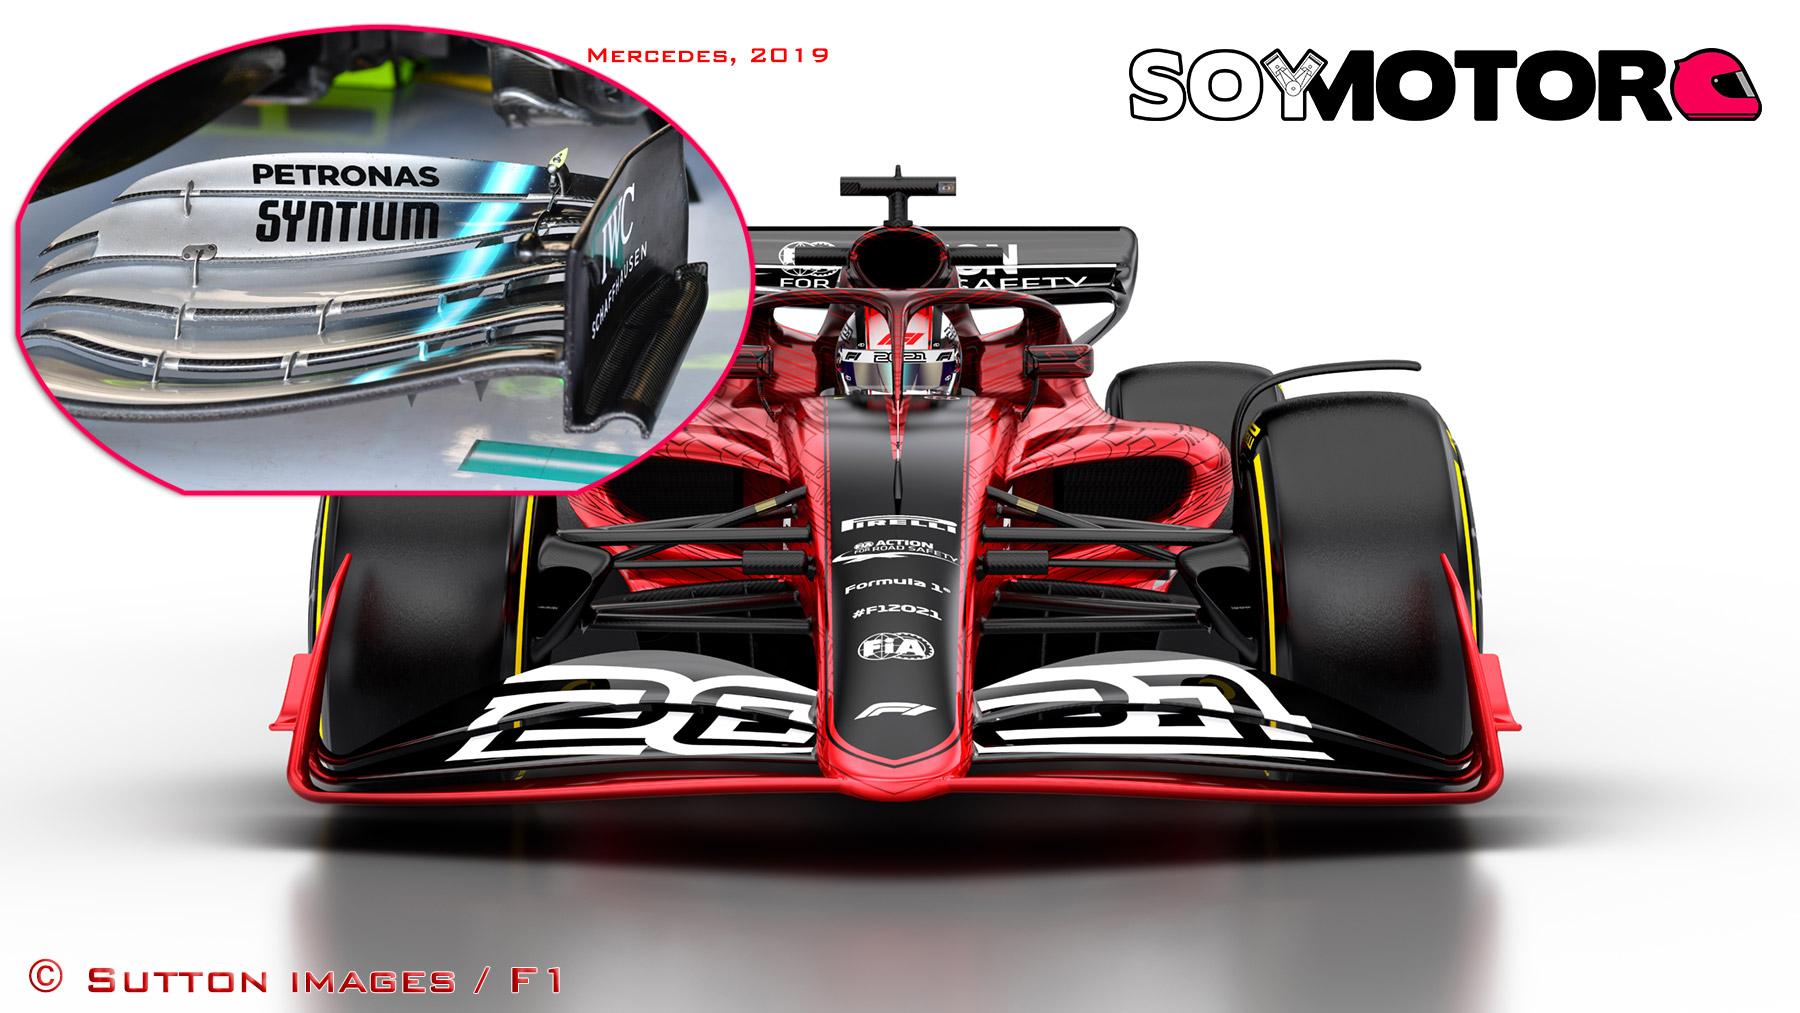 ala-delantera-2021_2_-soymotor.jpg